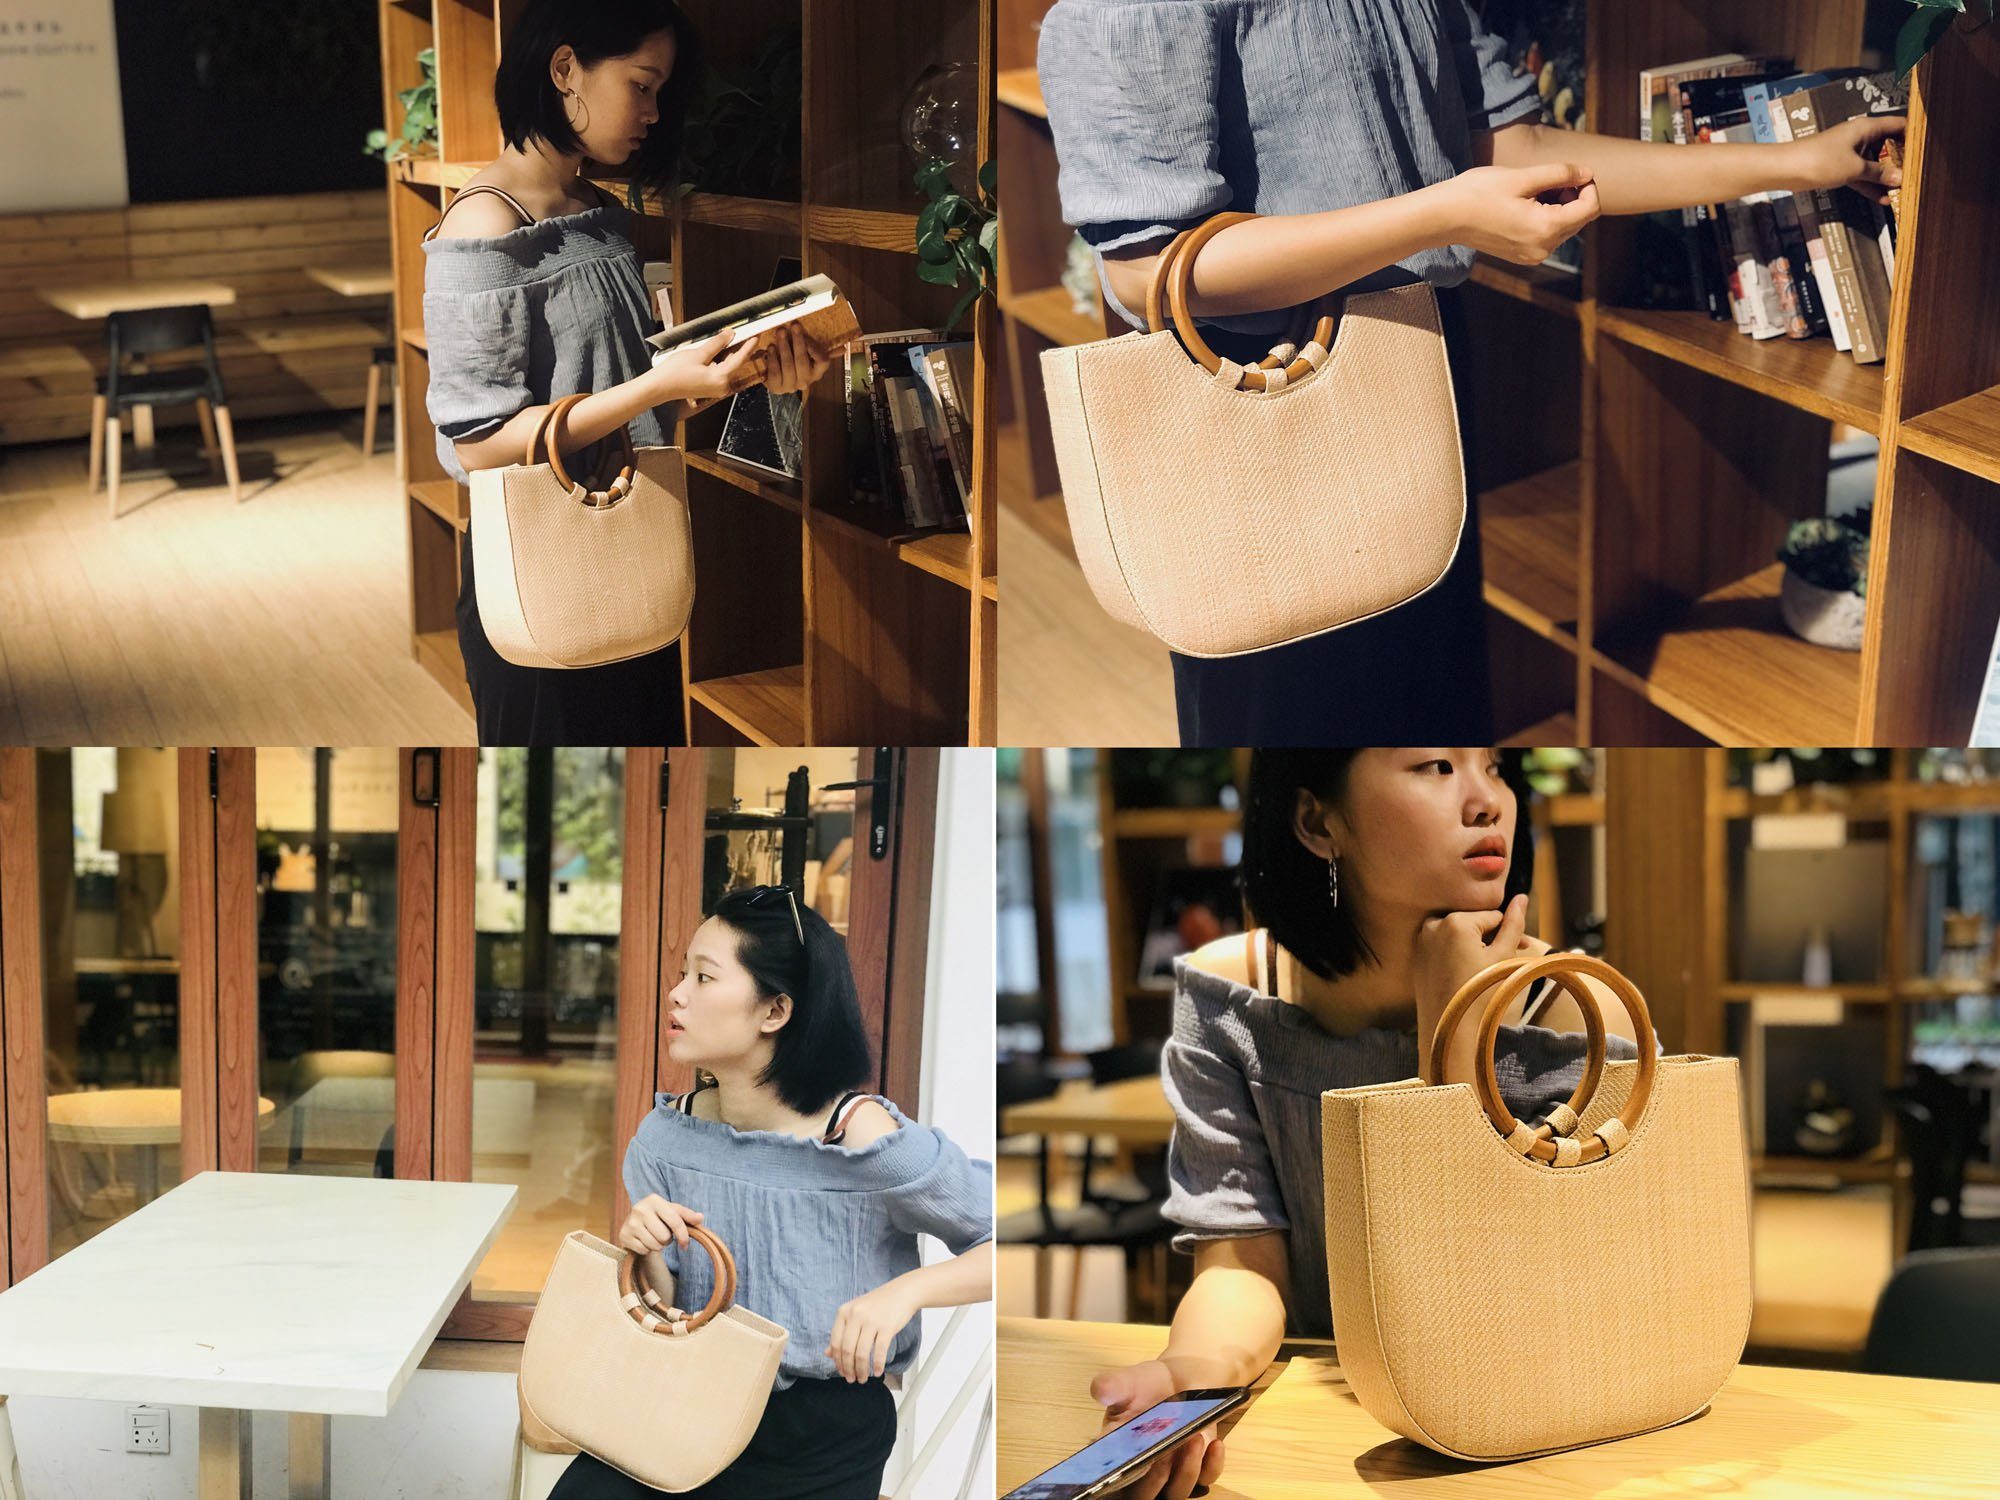 Youndcc Women Woven Straw Bag Rattan Bag Tote Bag Shoulder Bag Crossbody Bag Handbag Beach Bag, Handwoven/Crochet/Round Handle by Youndcc (Image #7)